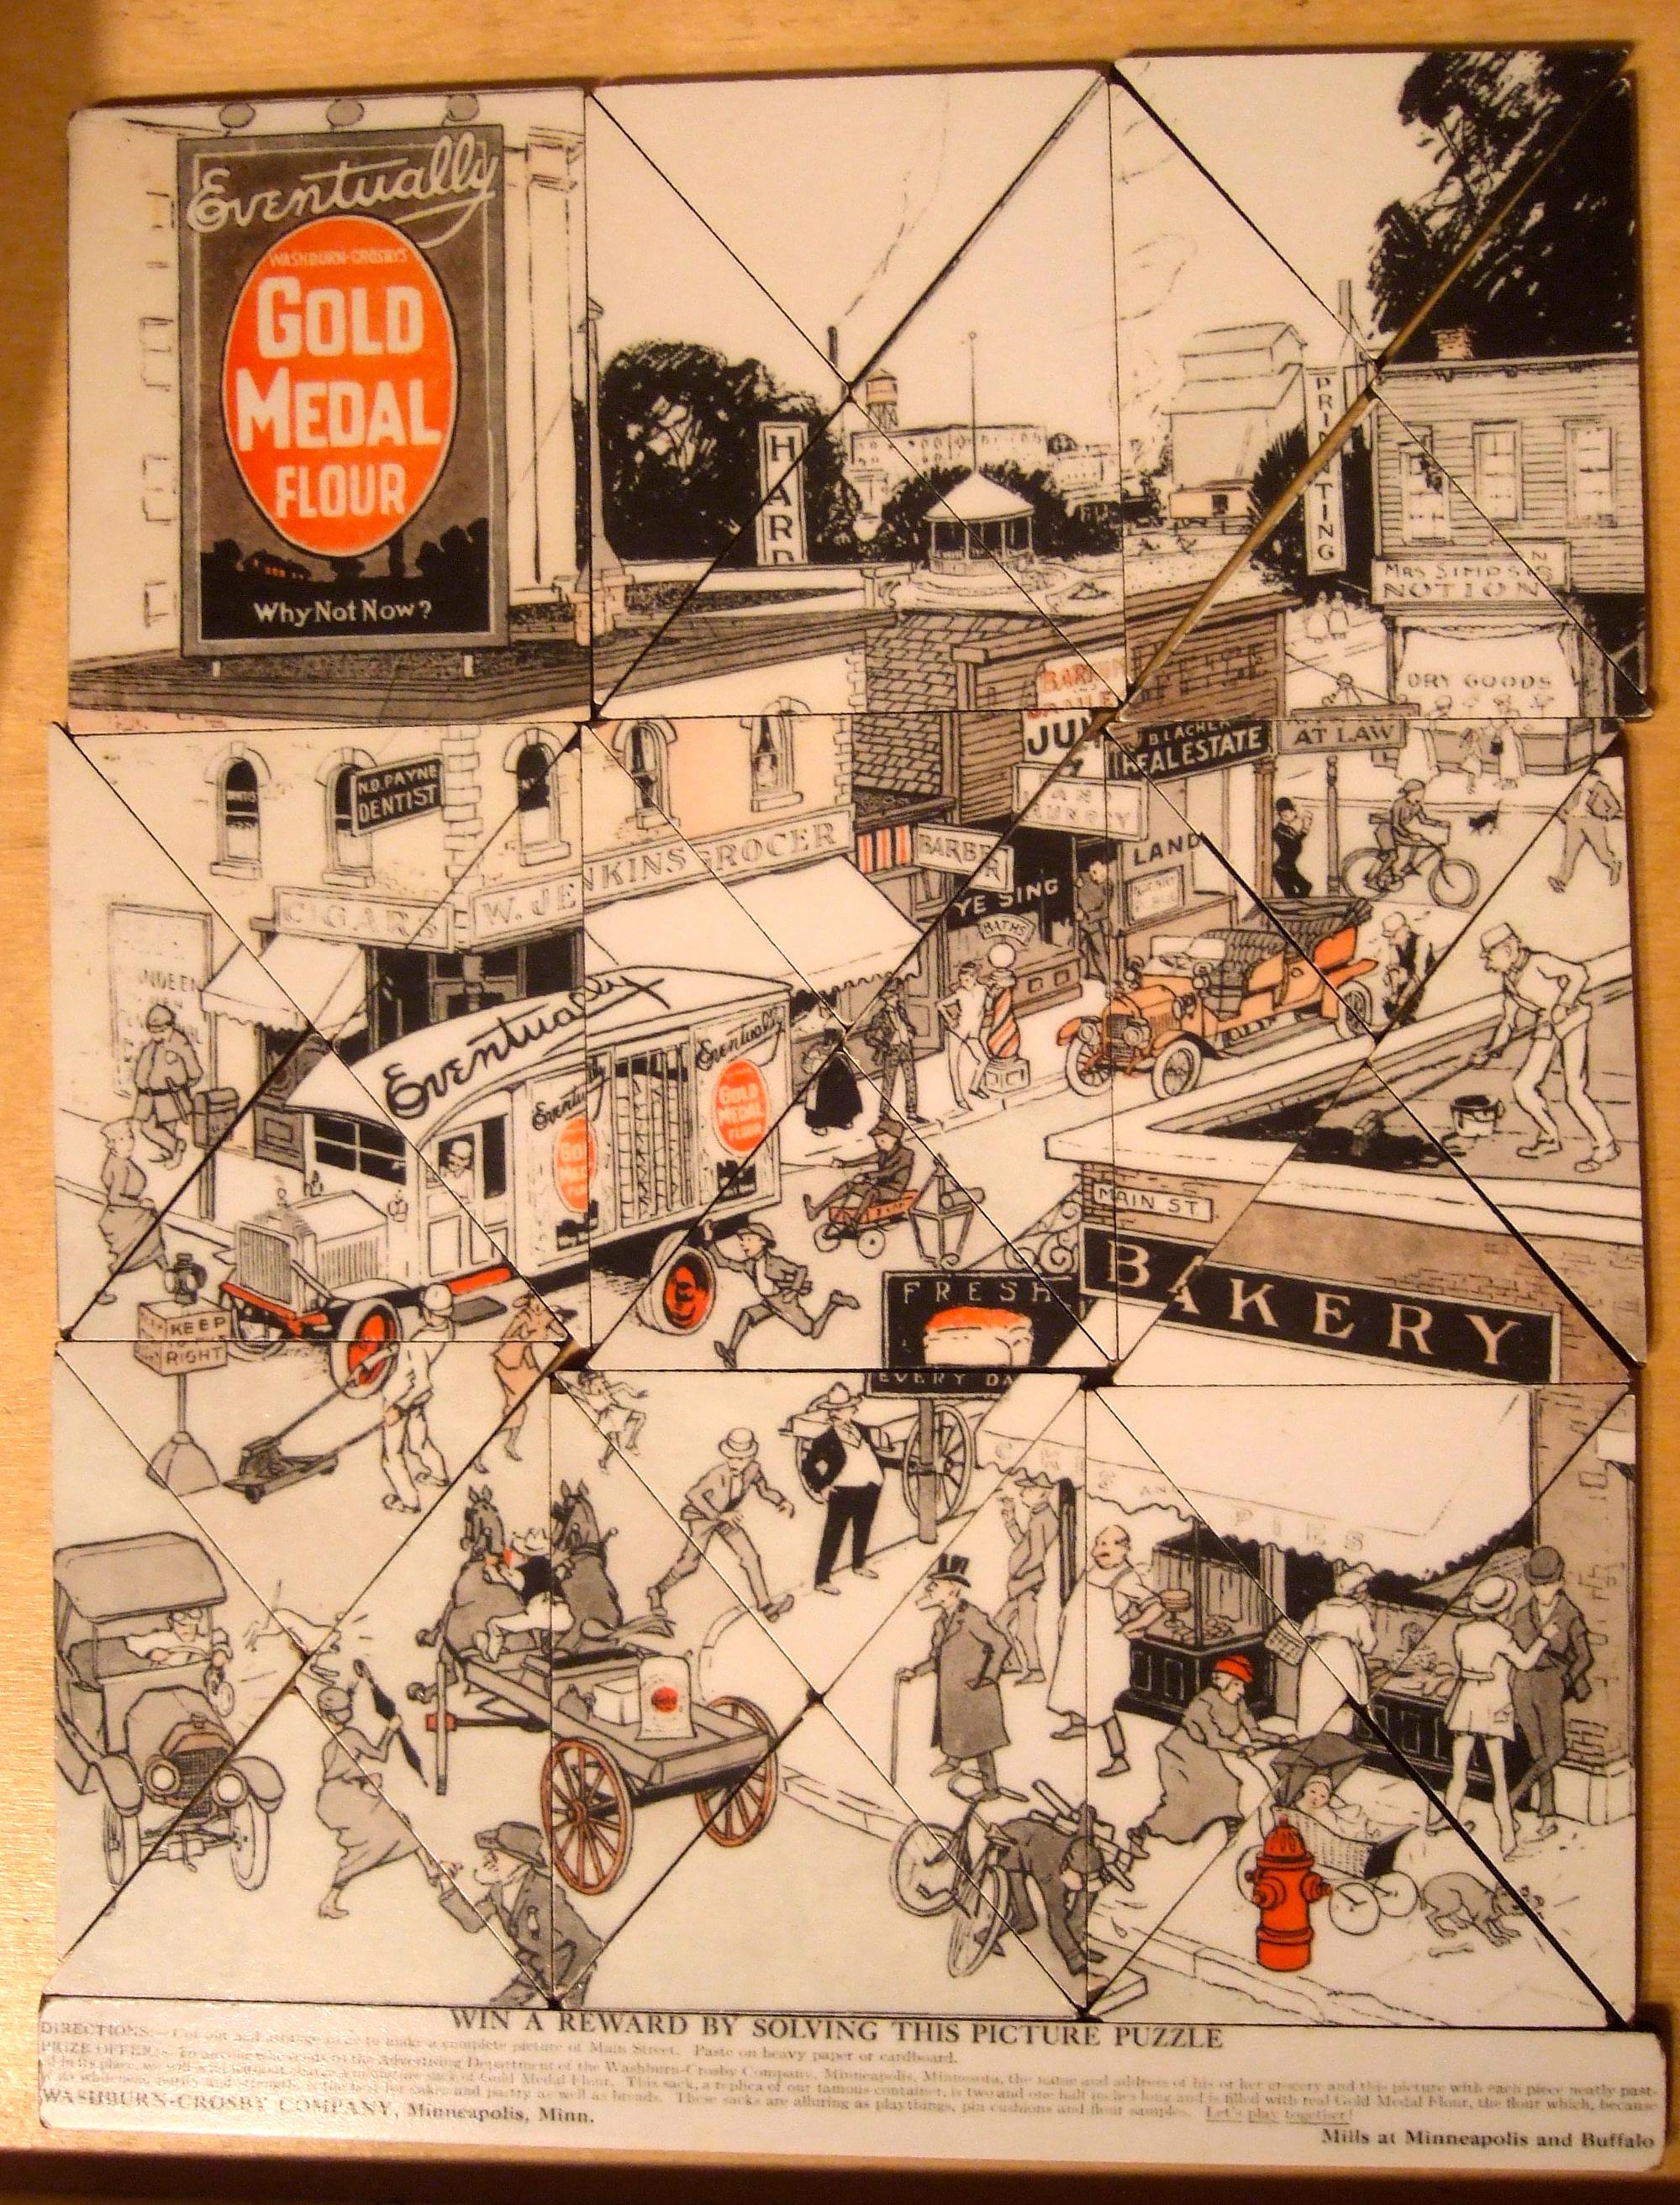 High Resolution Wallpaper | Finding Betty Crocker: The Secret Life Of America's First La 1999x2624 px